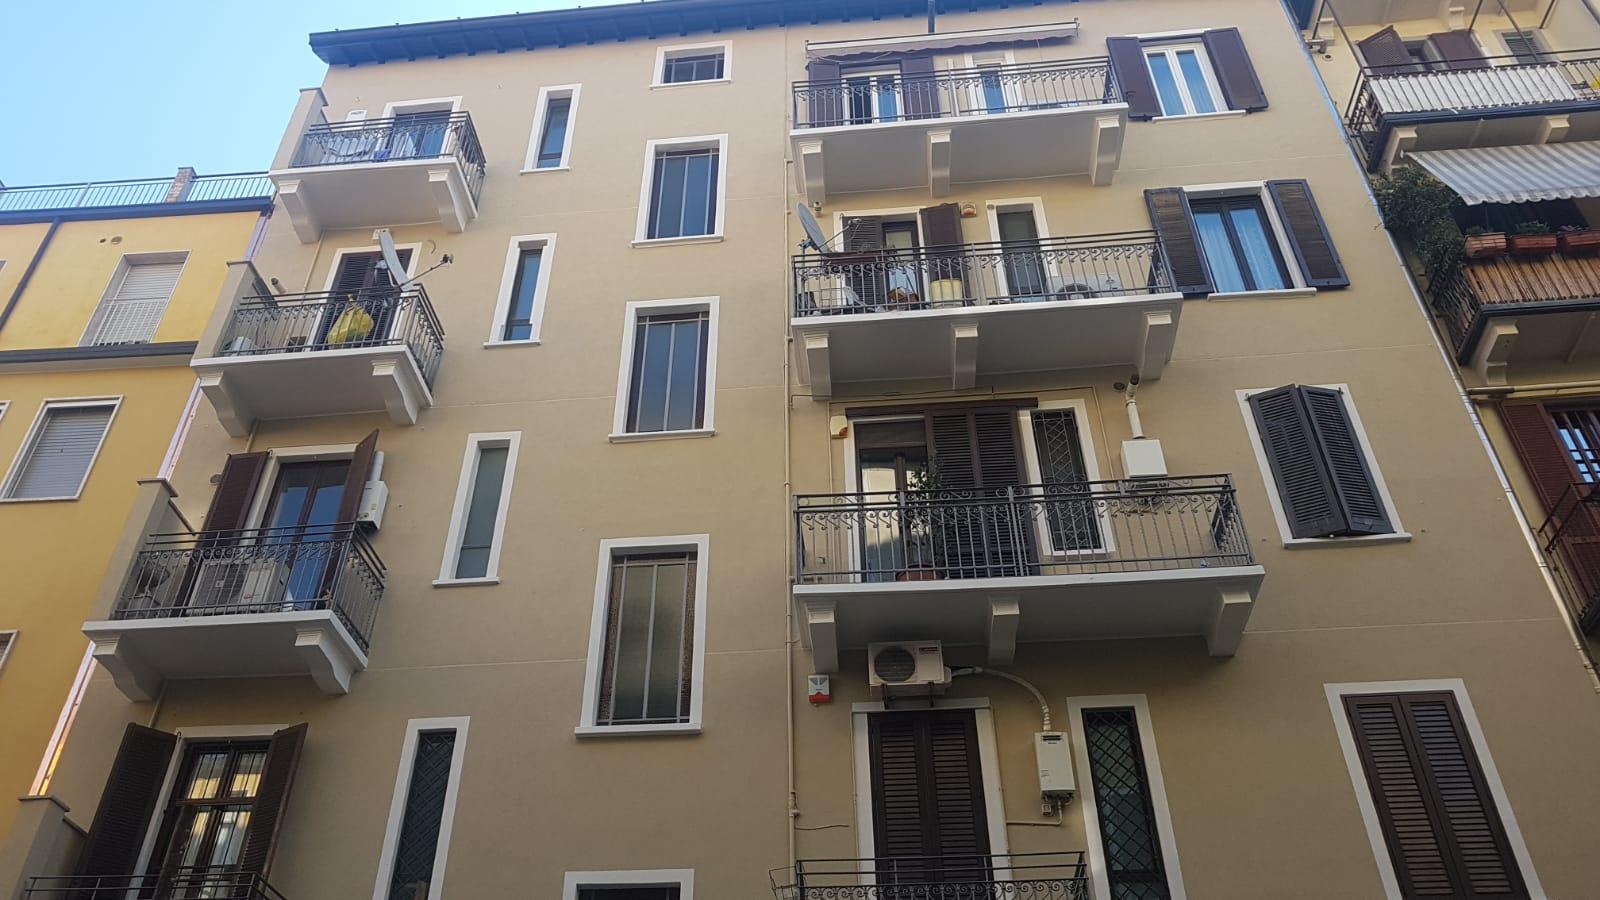 VIA CALDARA 19 - Milano